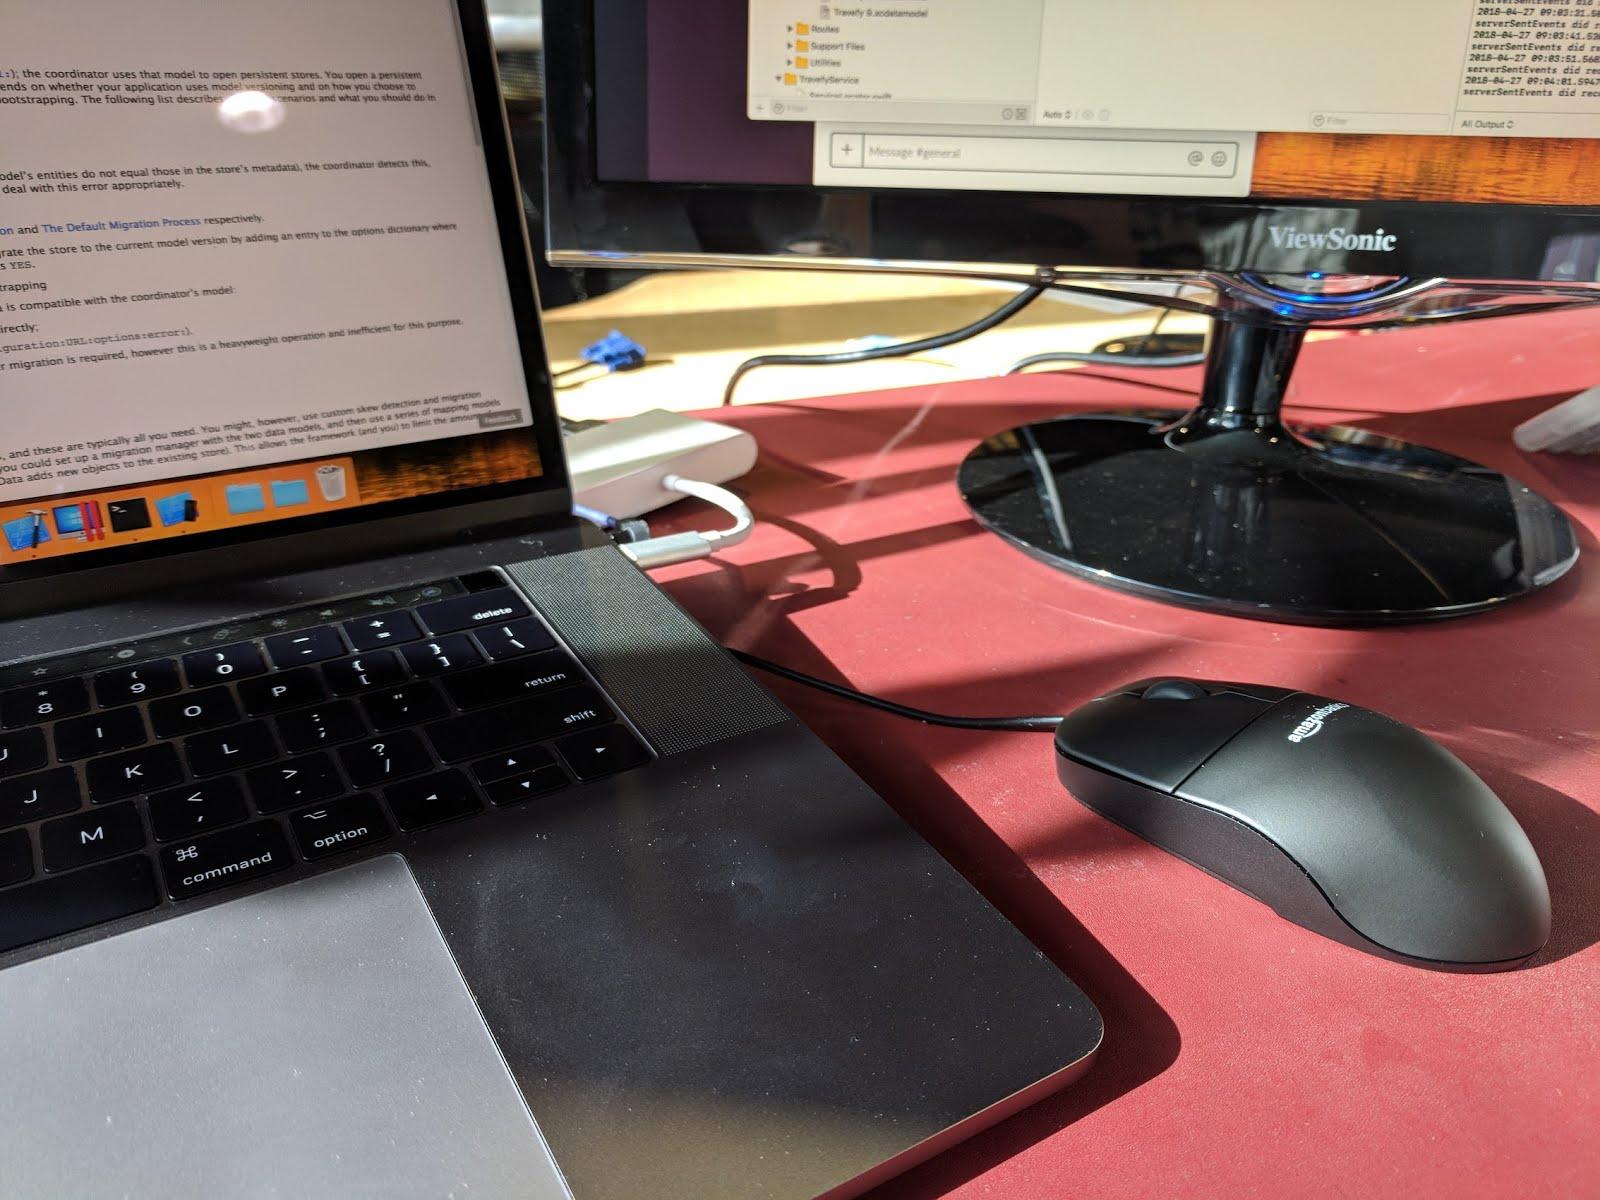 new job work desk mac mouse keyboard monitor screen standing desk